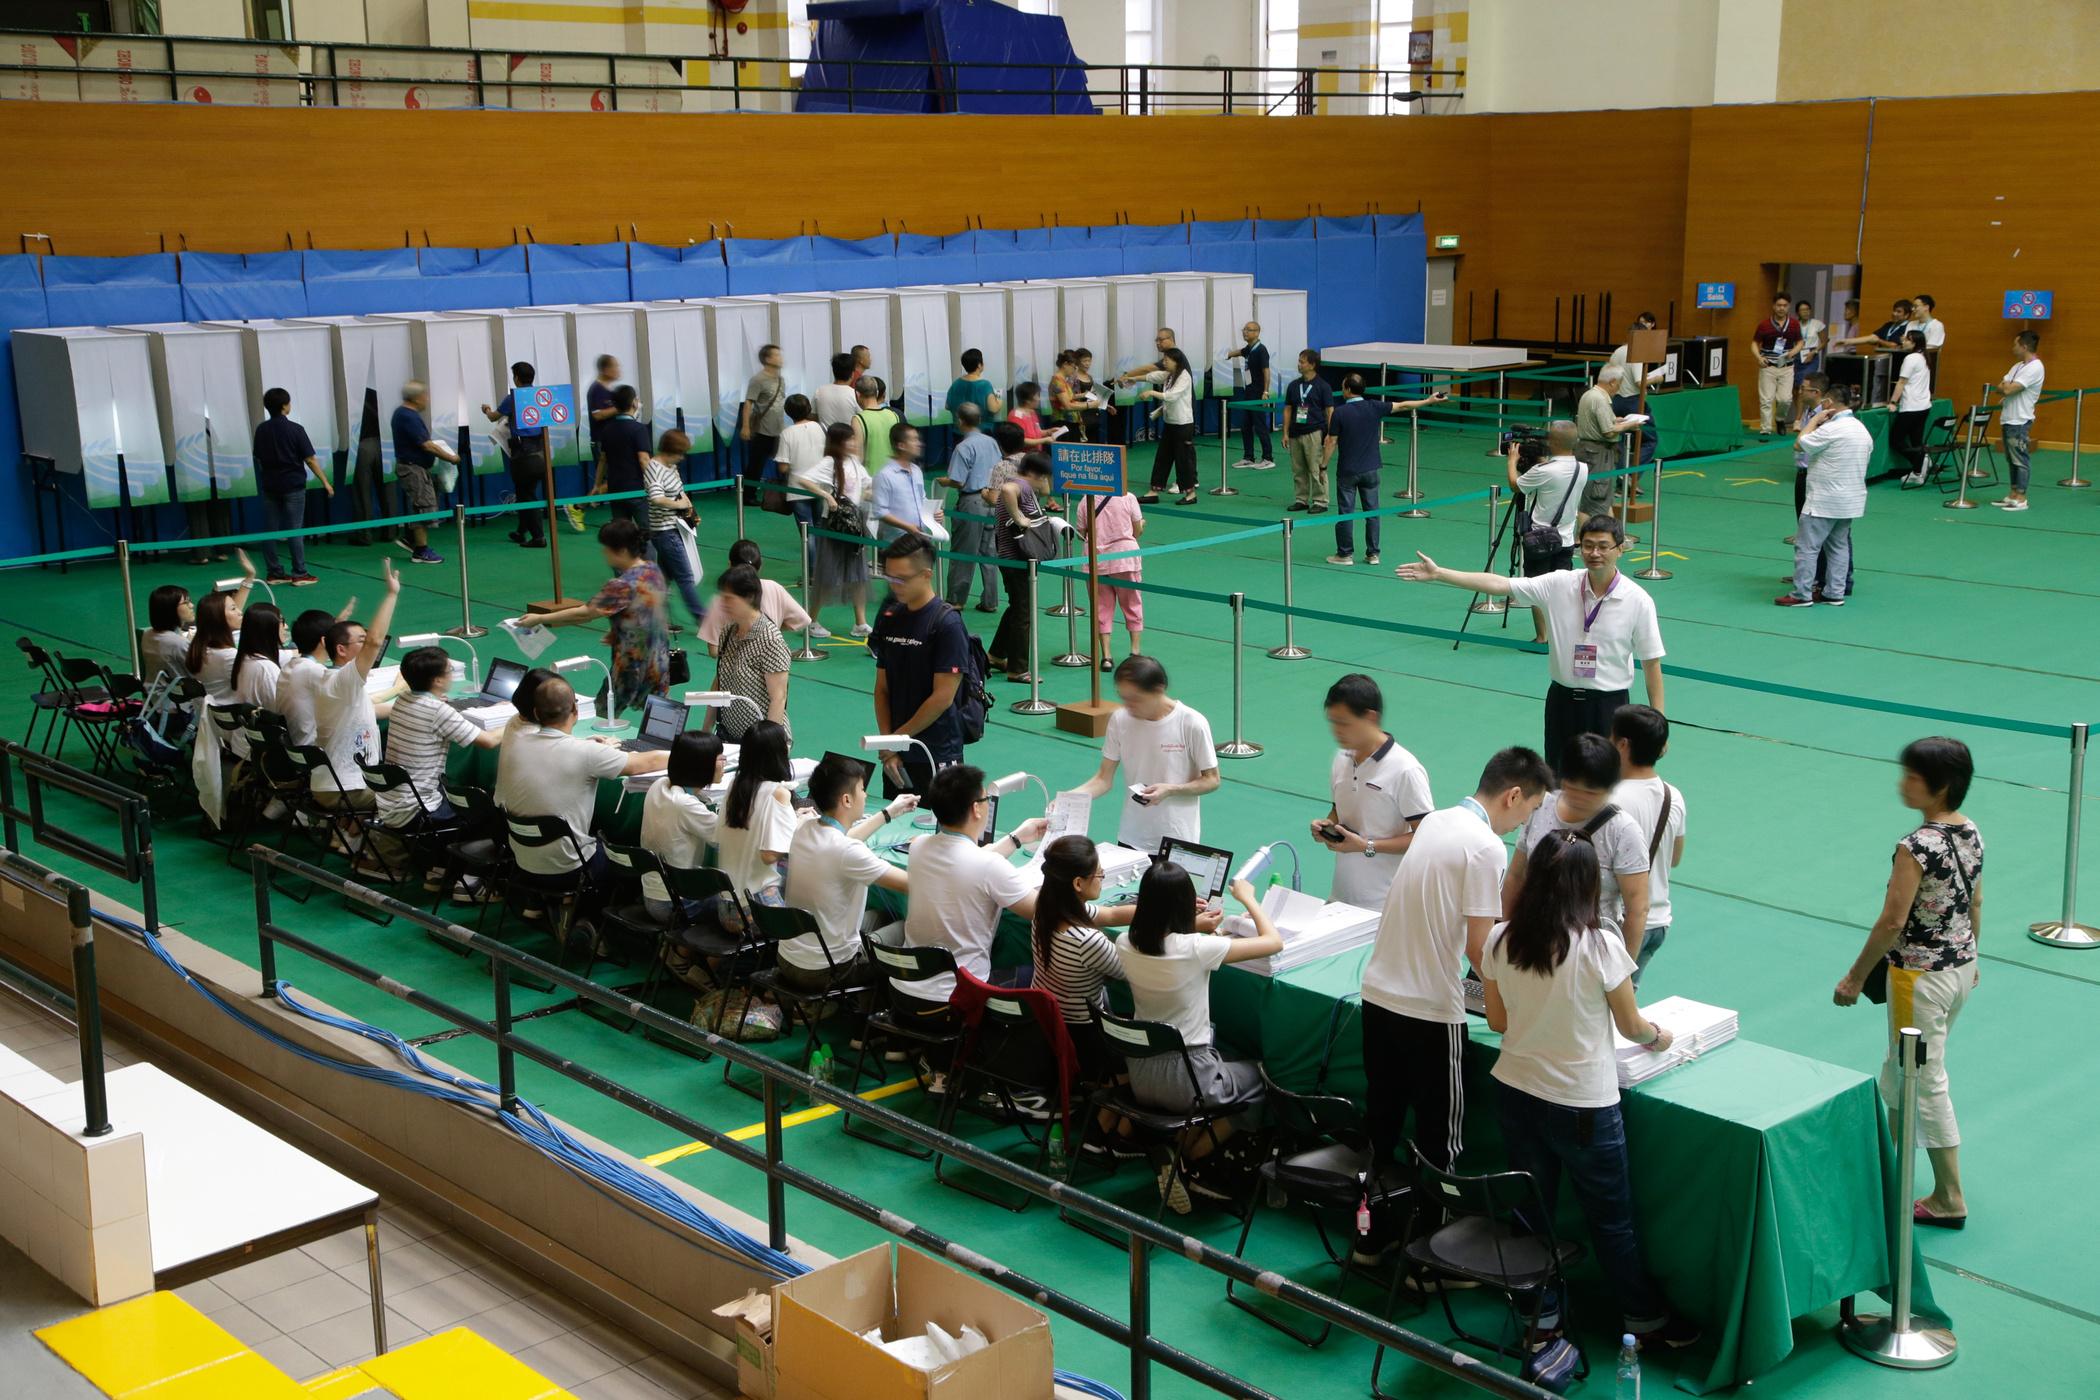 Eleições   Resultados de sufrágio para a Assembleia Legislativa surpreendem